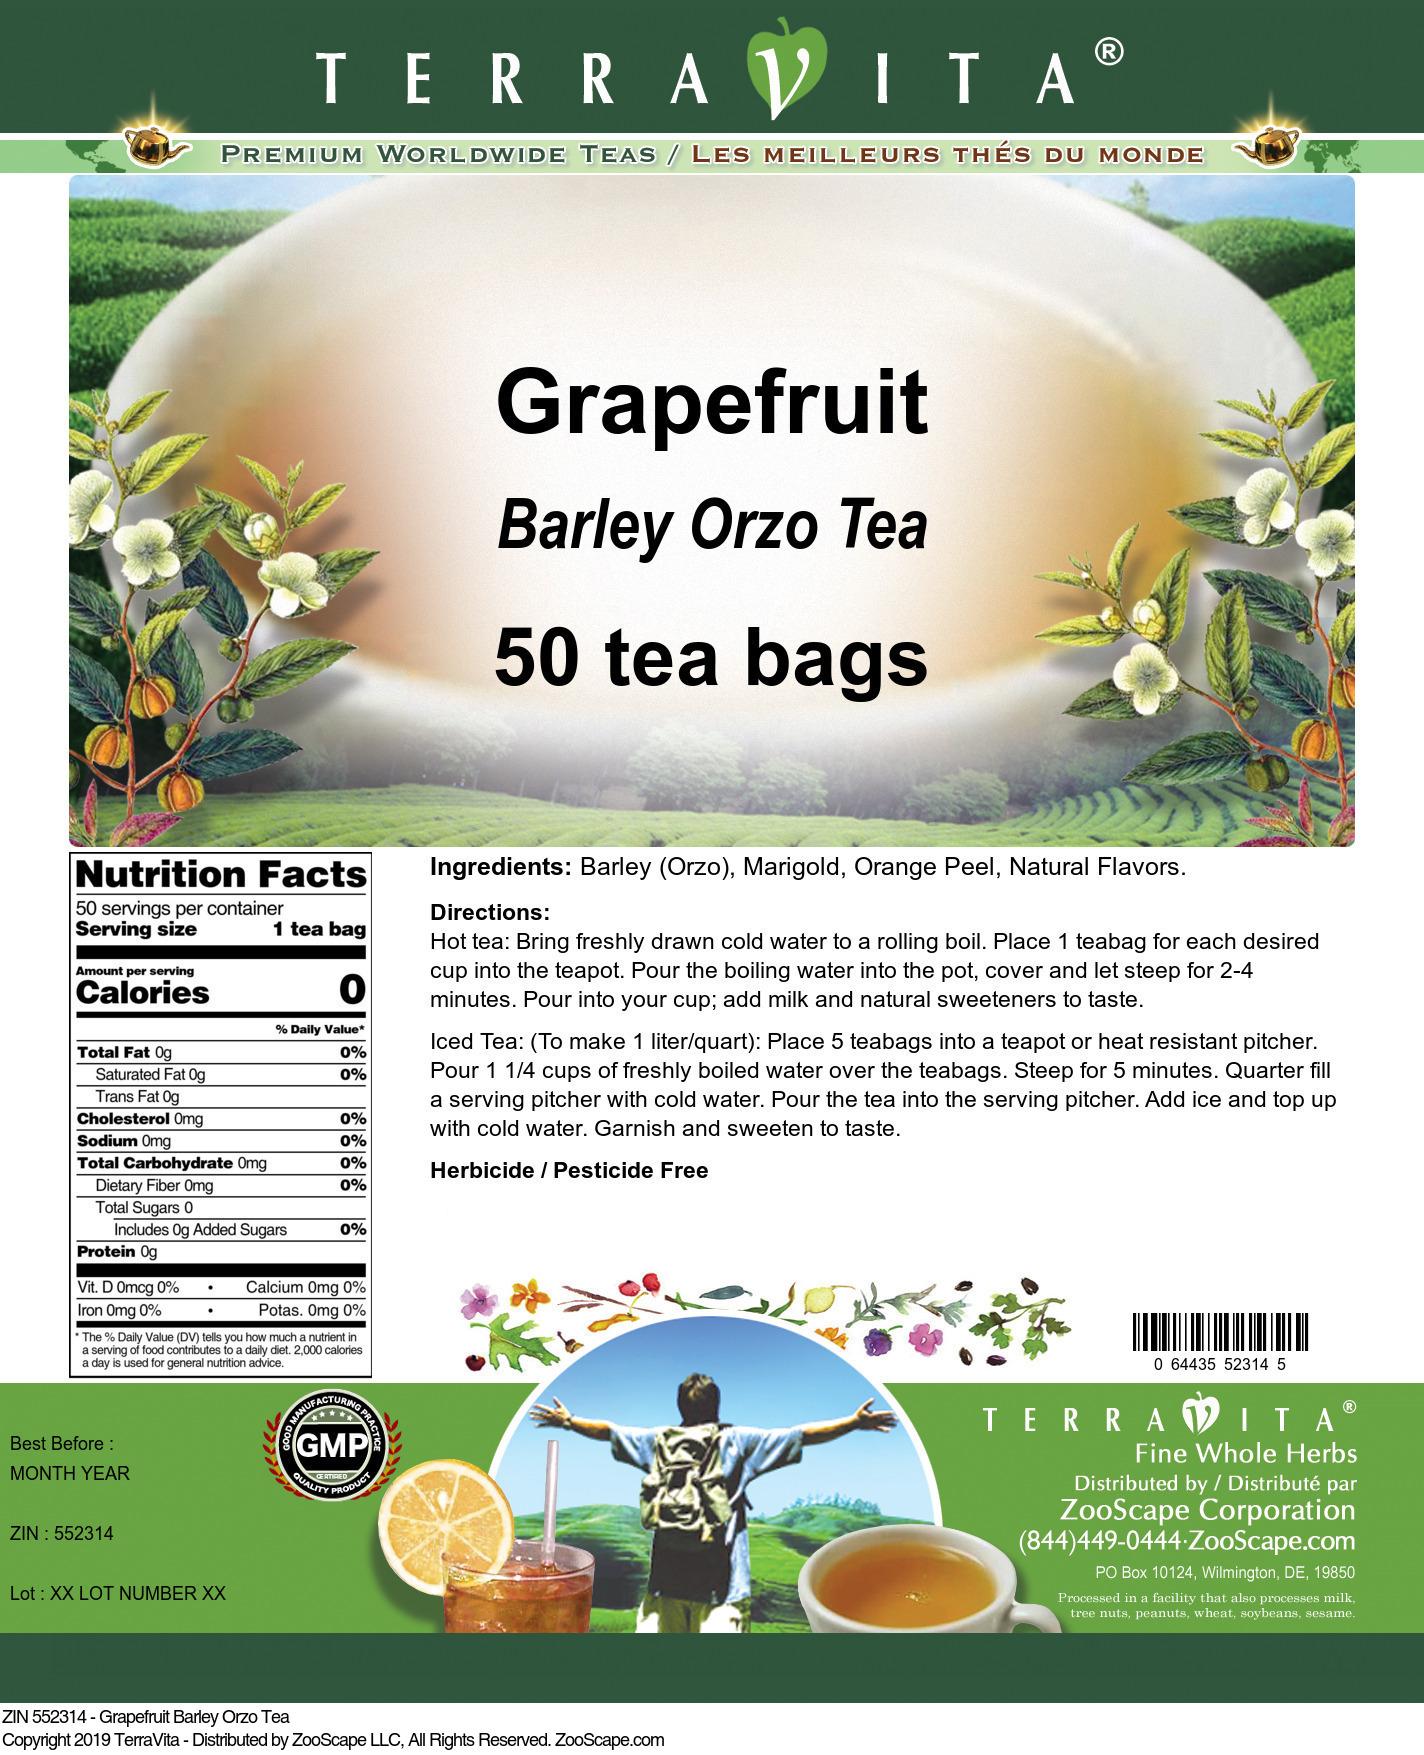 Grapefruit Barley Orzo Tea